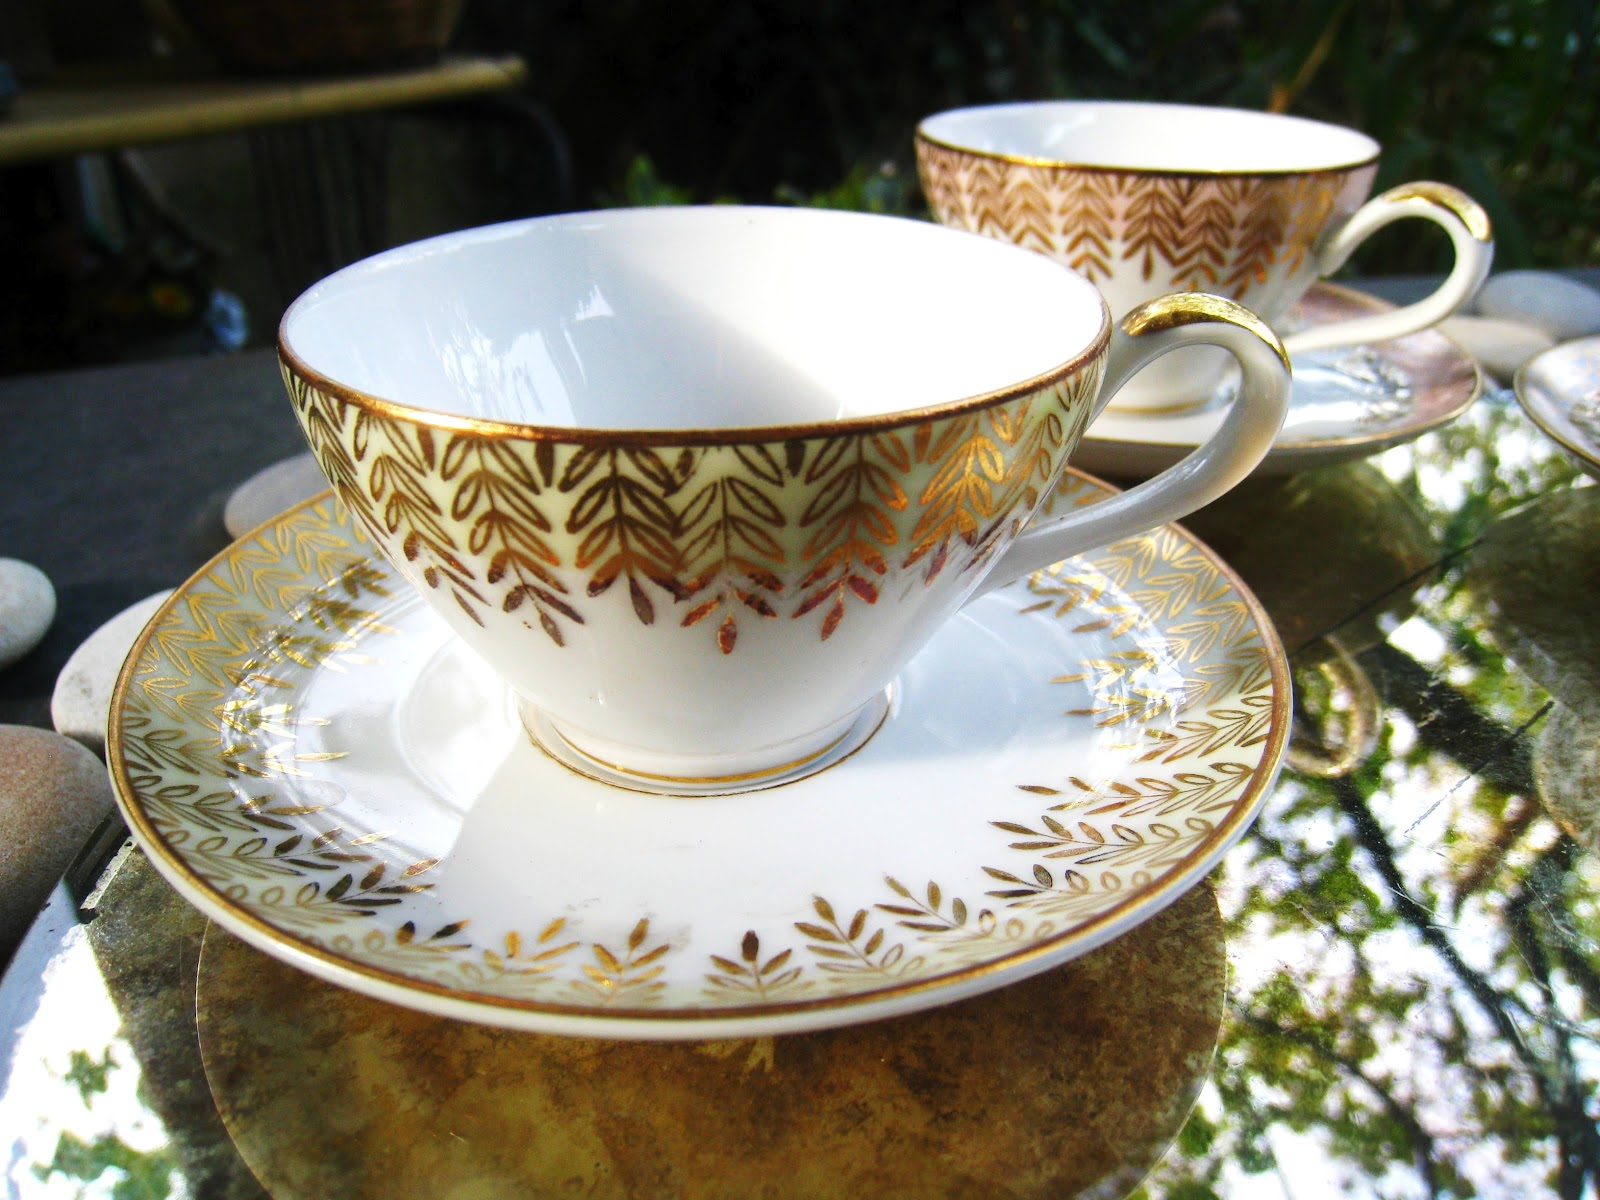 les dedees vintage recup creations tasses fines feuilles d 39 or by anne. Black Bedroom Furniture Sets. Home Design Ideas